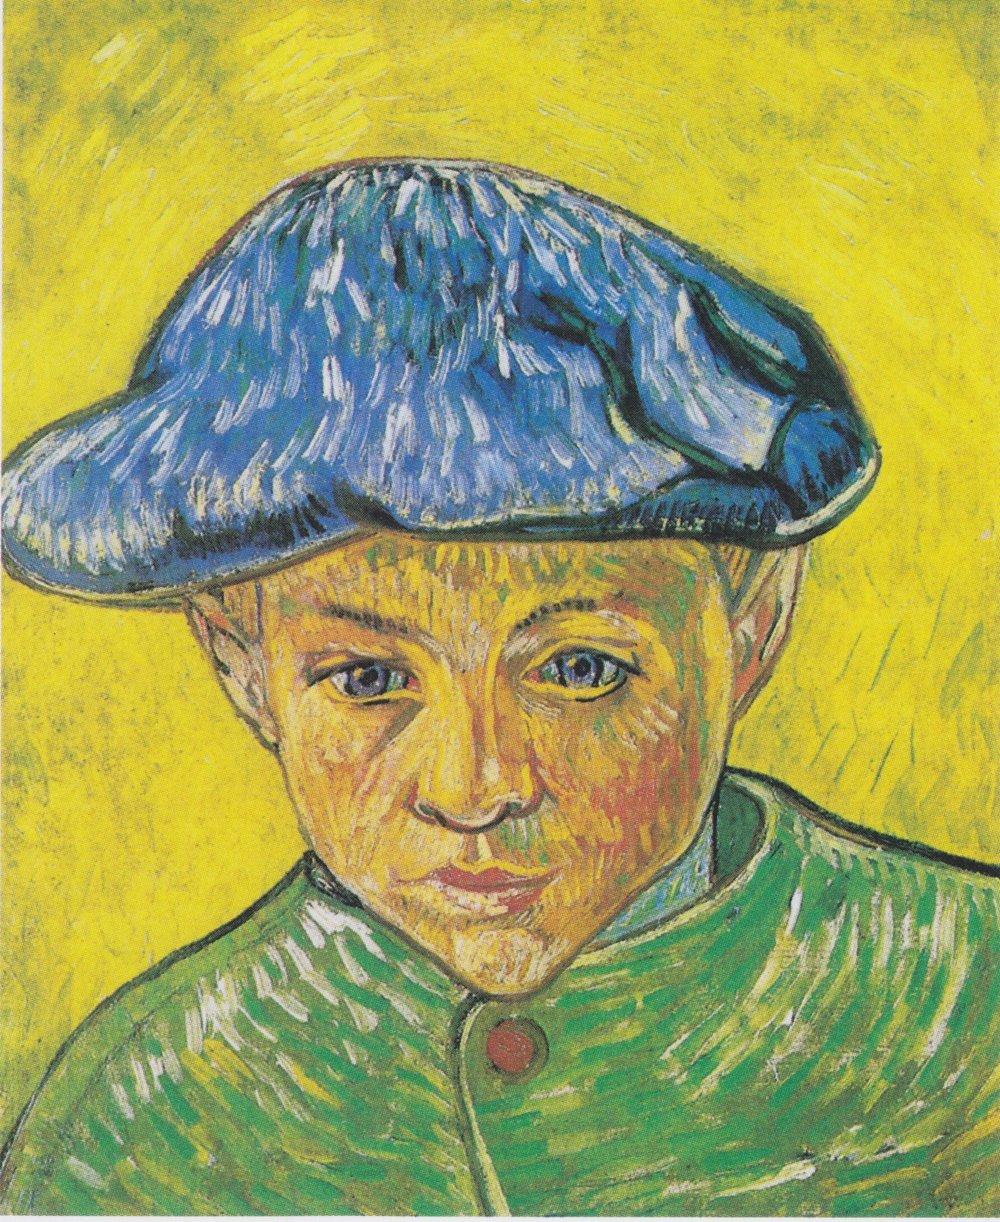 Van_Gogh_-_Bildnis_Camile_Roulin2.jpeg